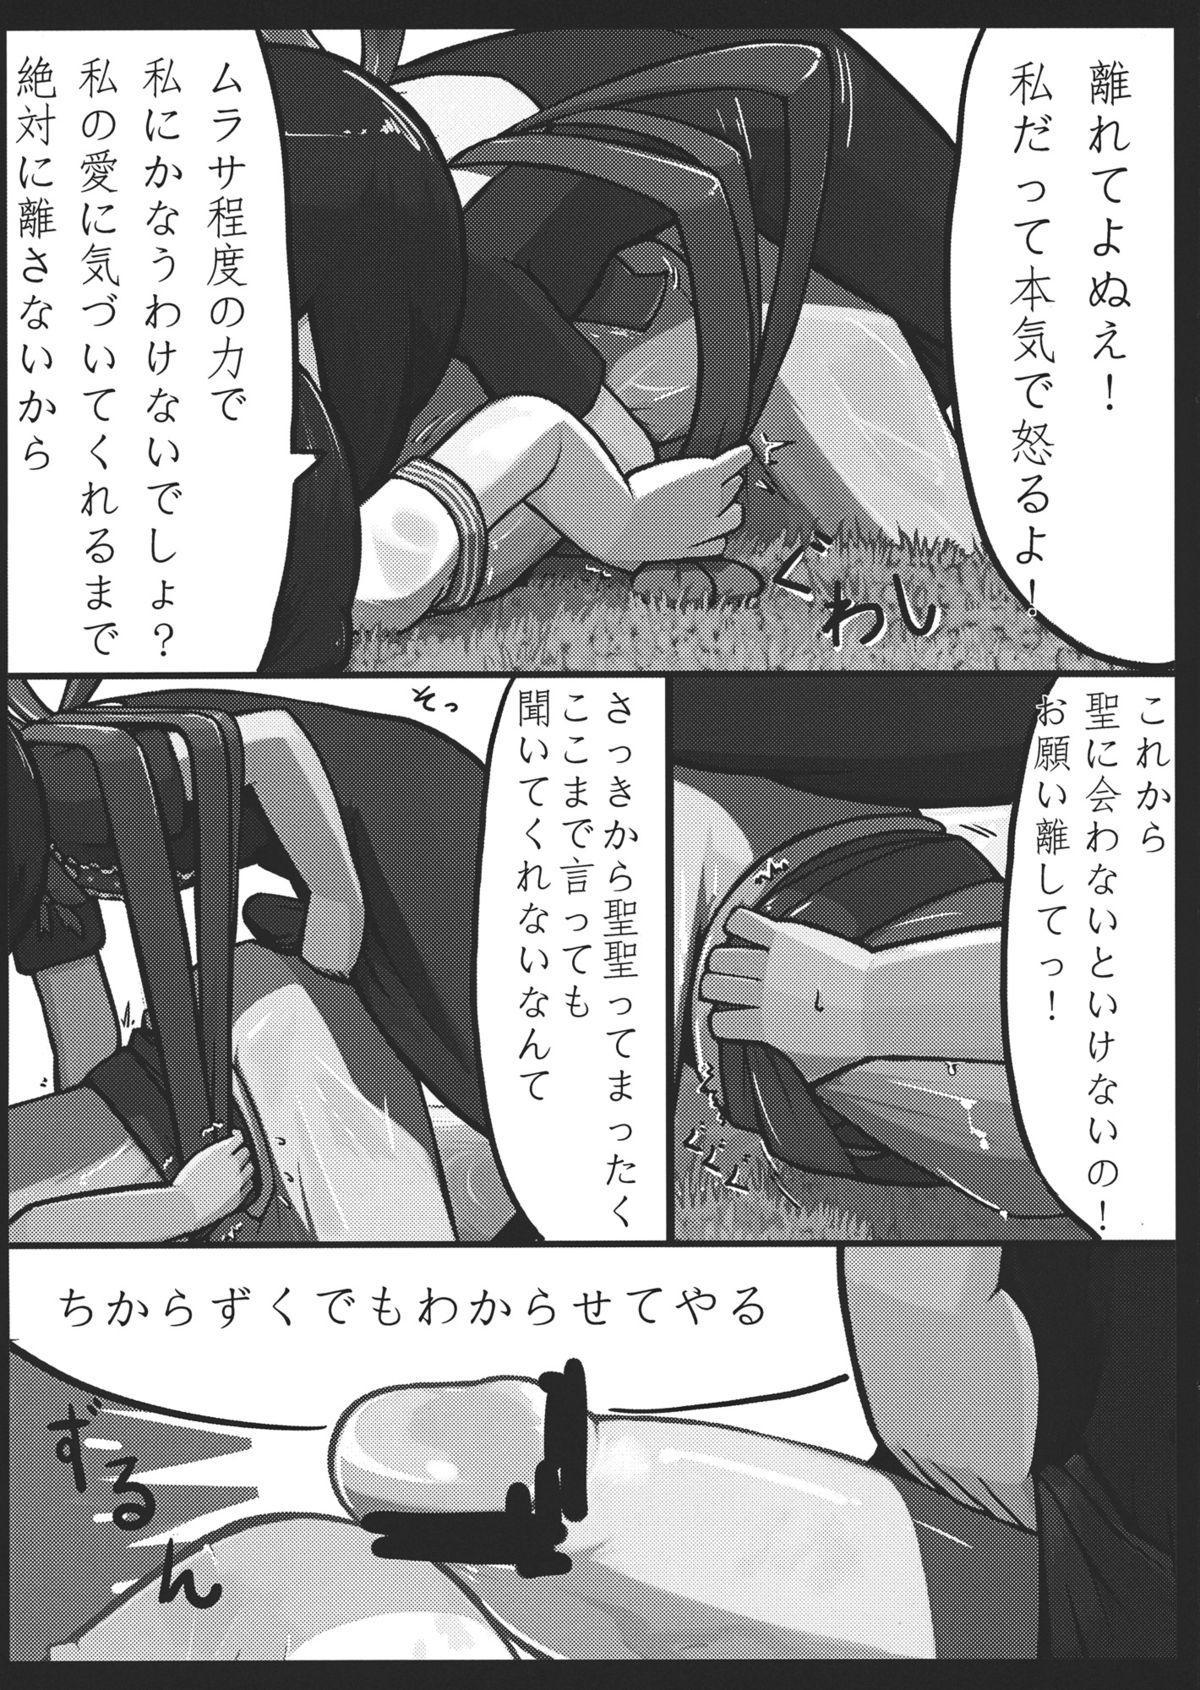 Nue x Murasa Shunga 10